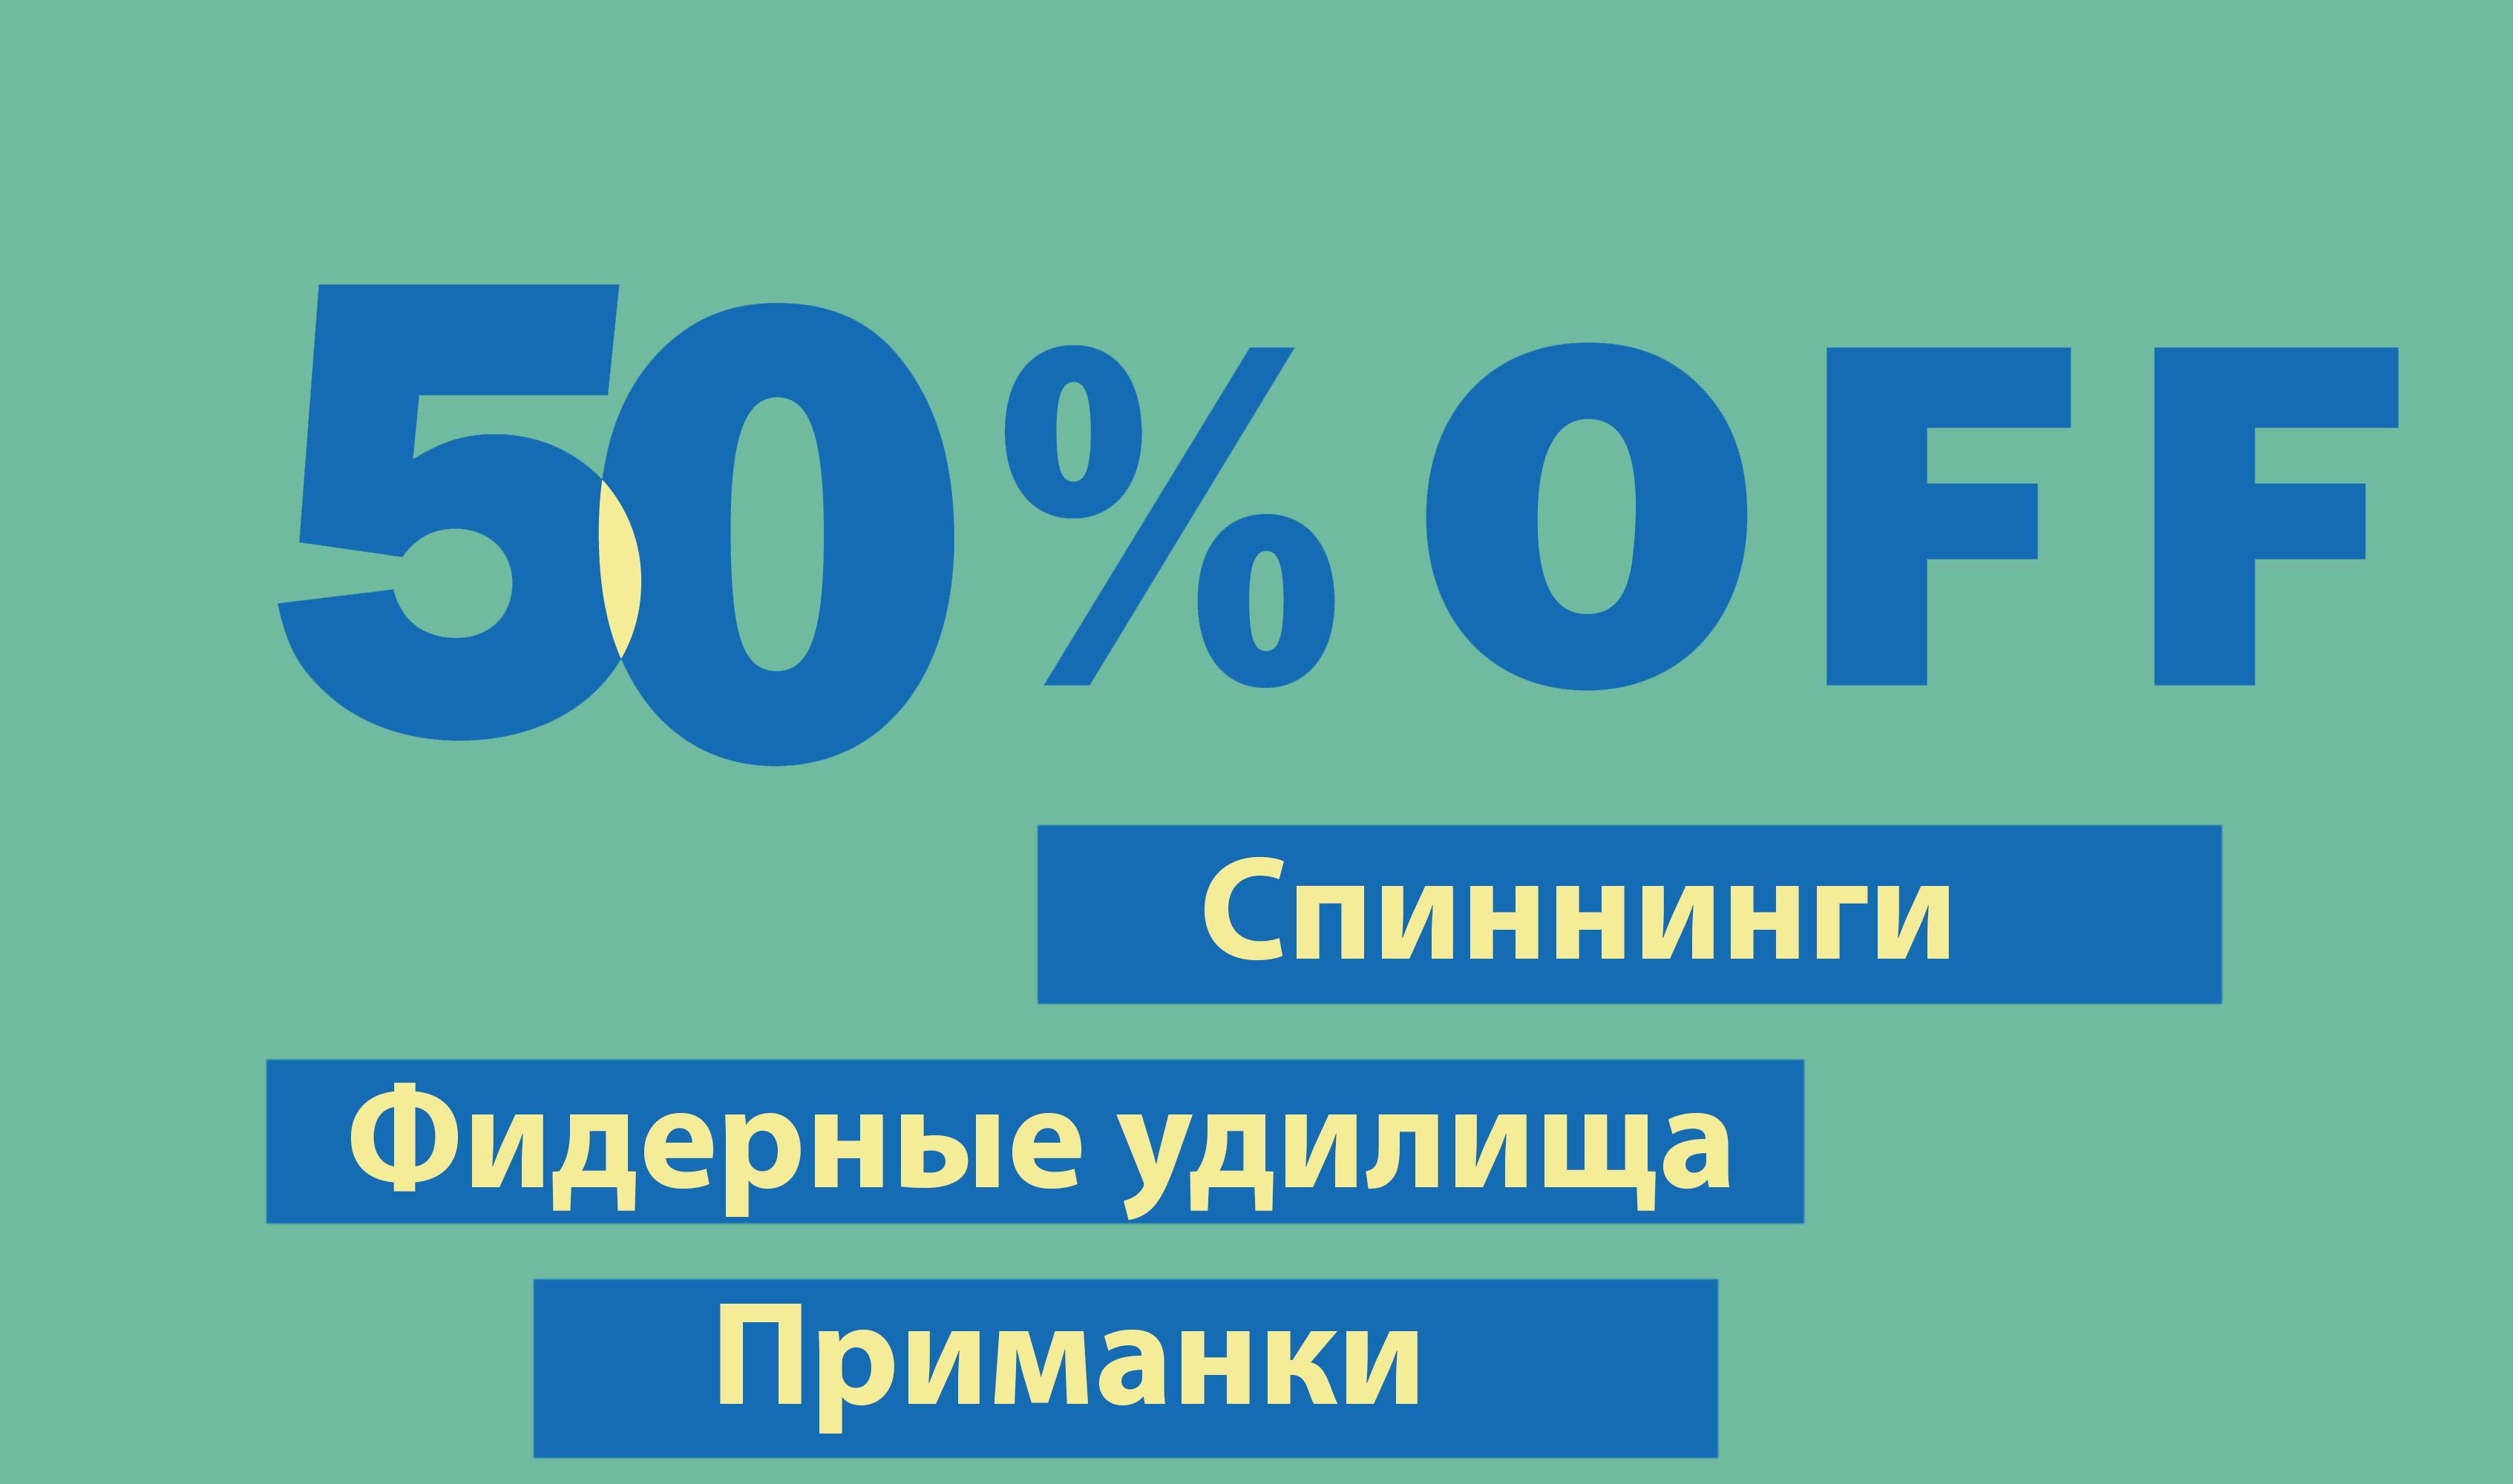 У нас весенняя АКЦИЯ! минус 50% на широкий ряд товаров!